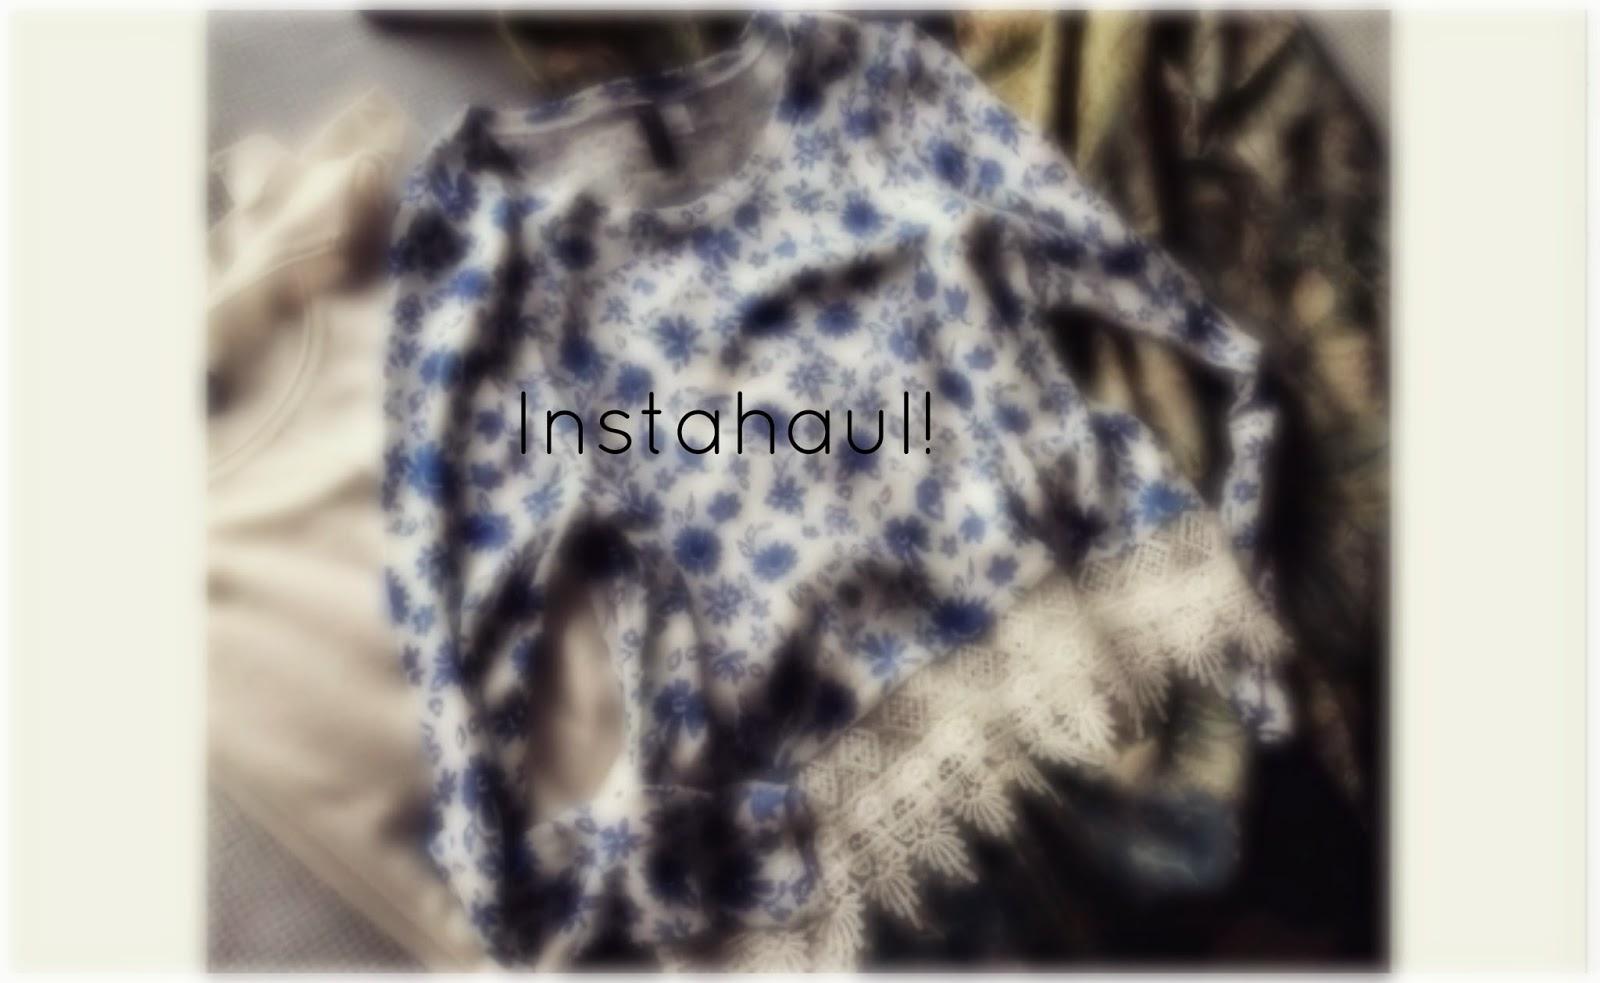 instahaul h&m clothing haul